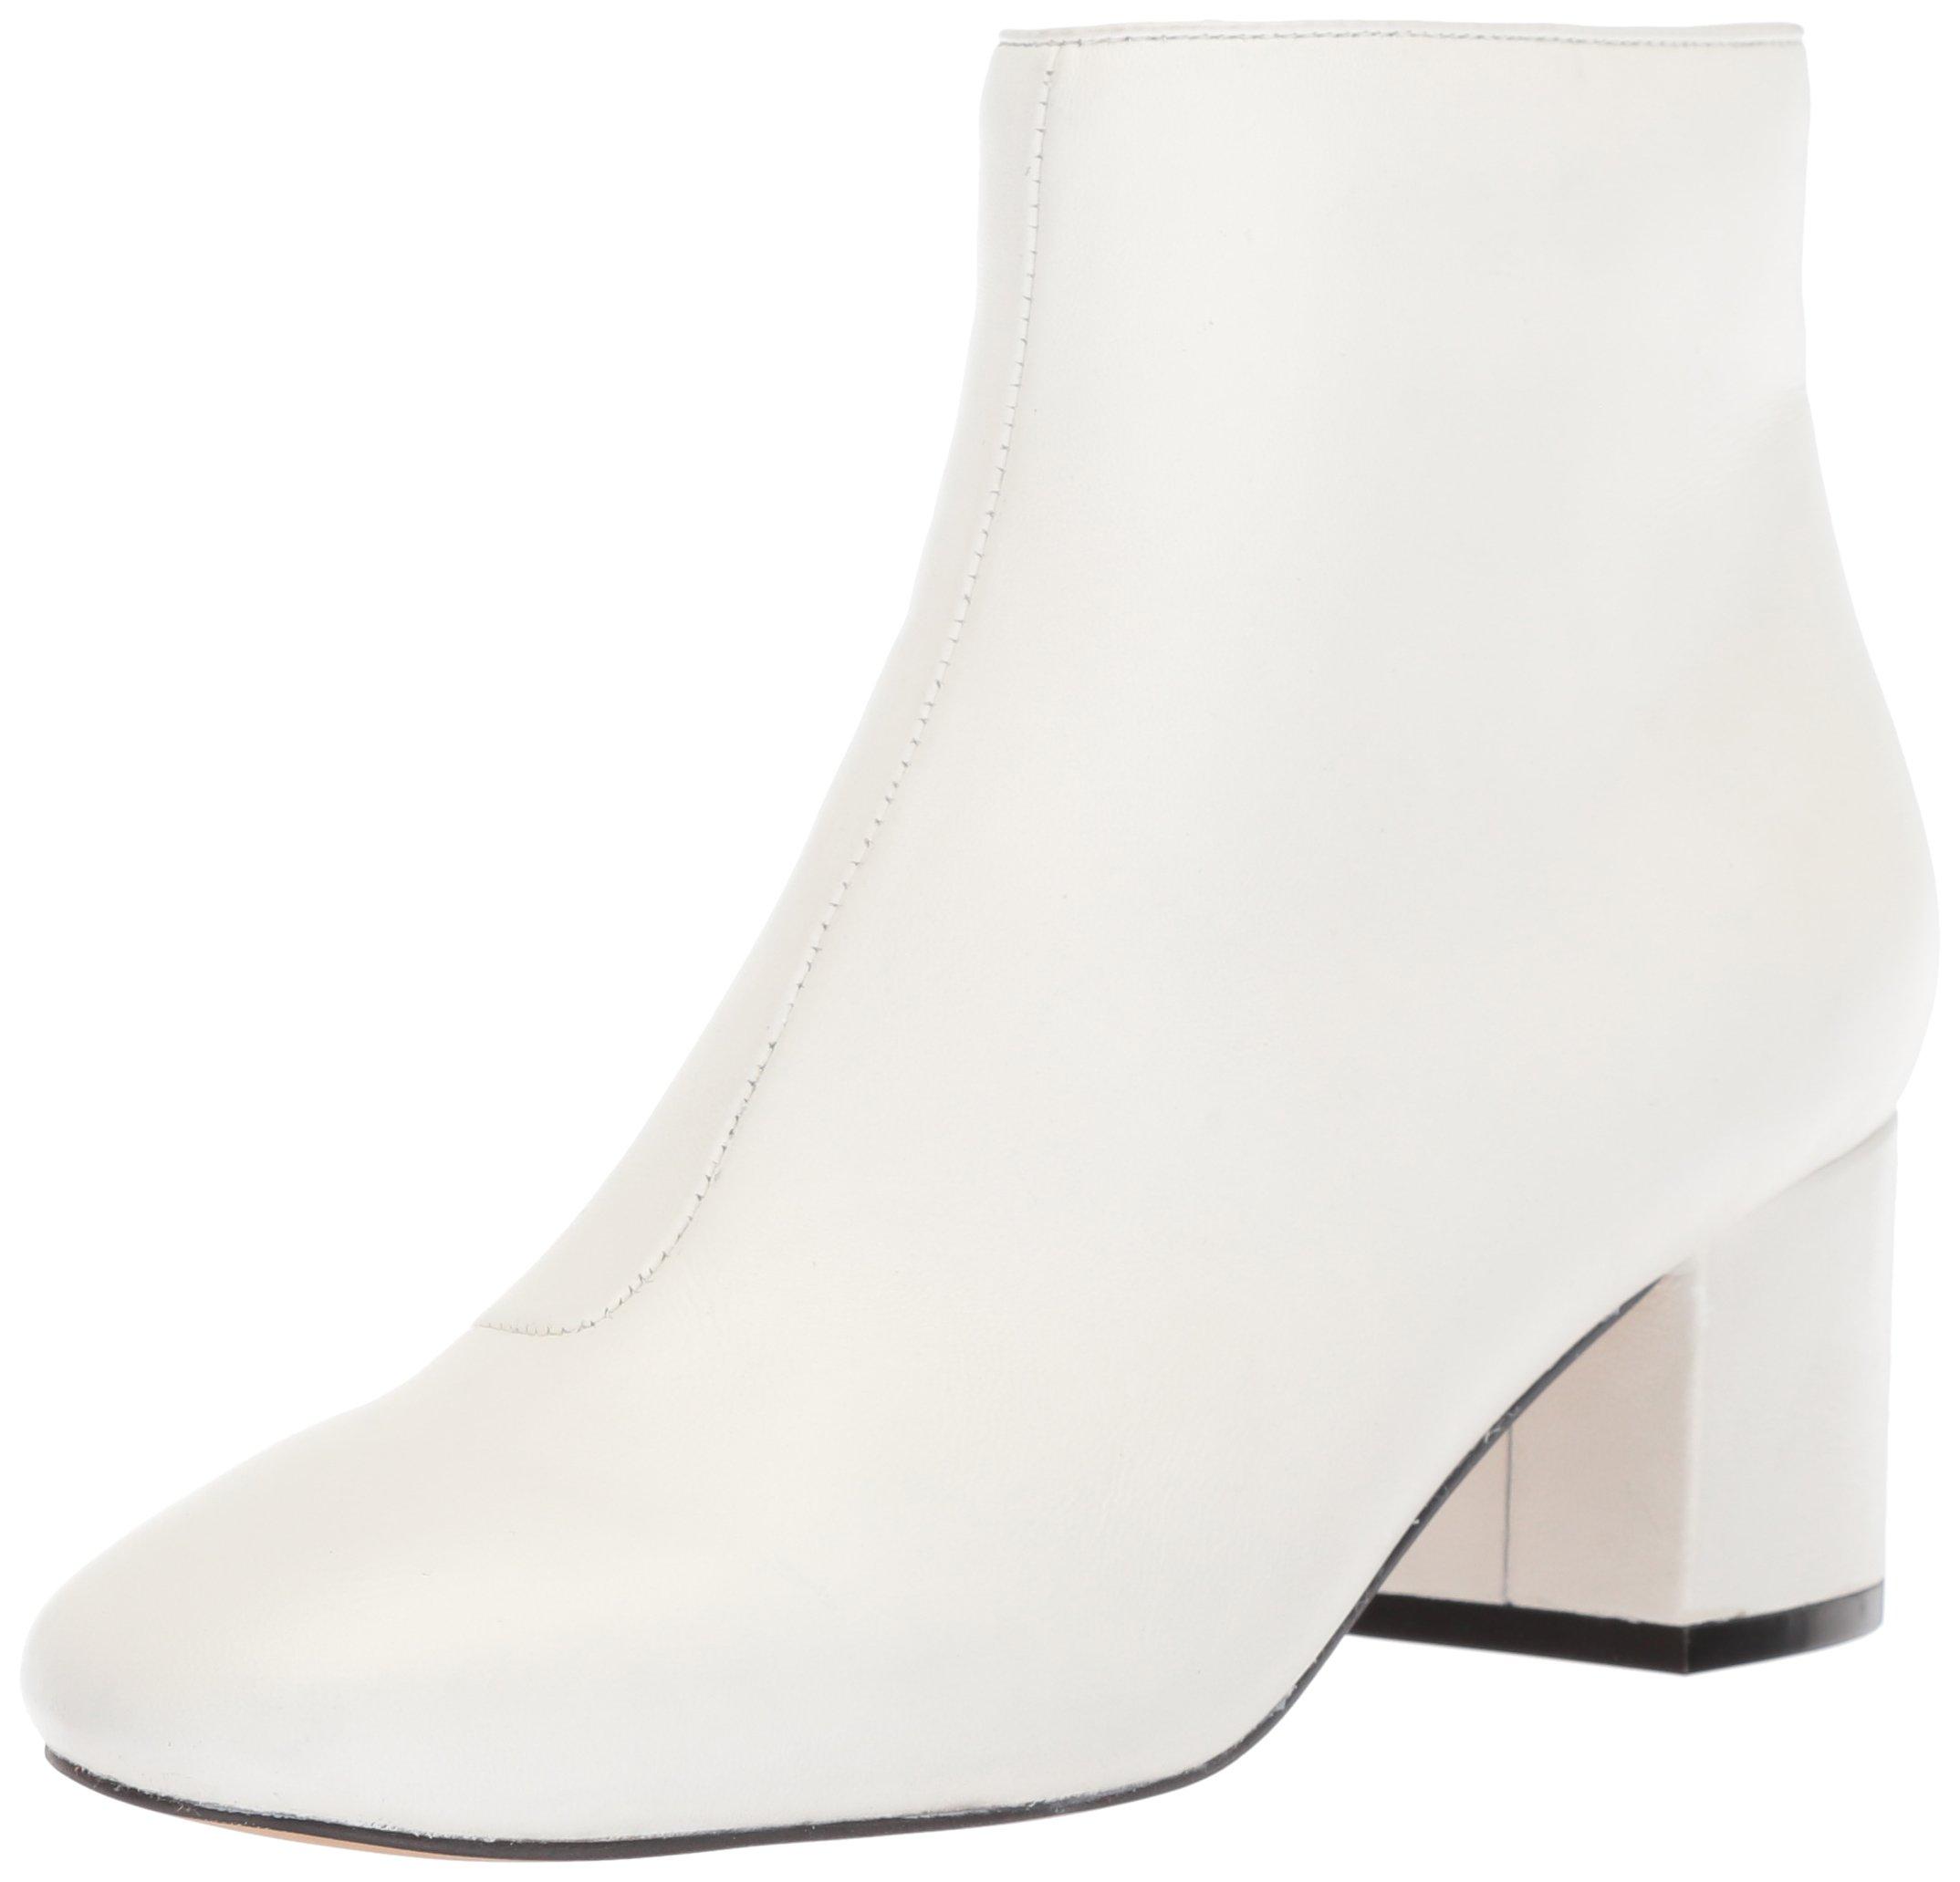 The Fix Women's Daniella Block-Heel Bootie Ankle Boot, Bright White Leather, 9.5 B US